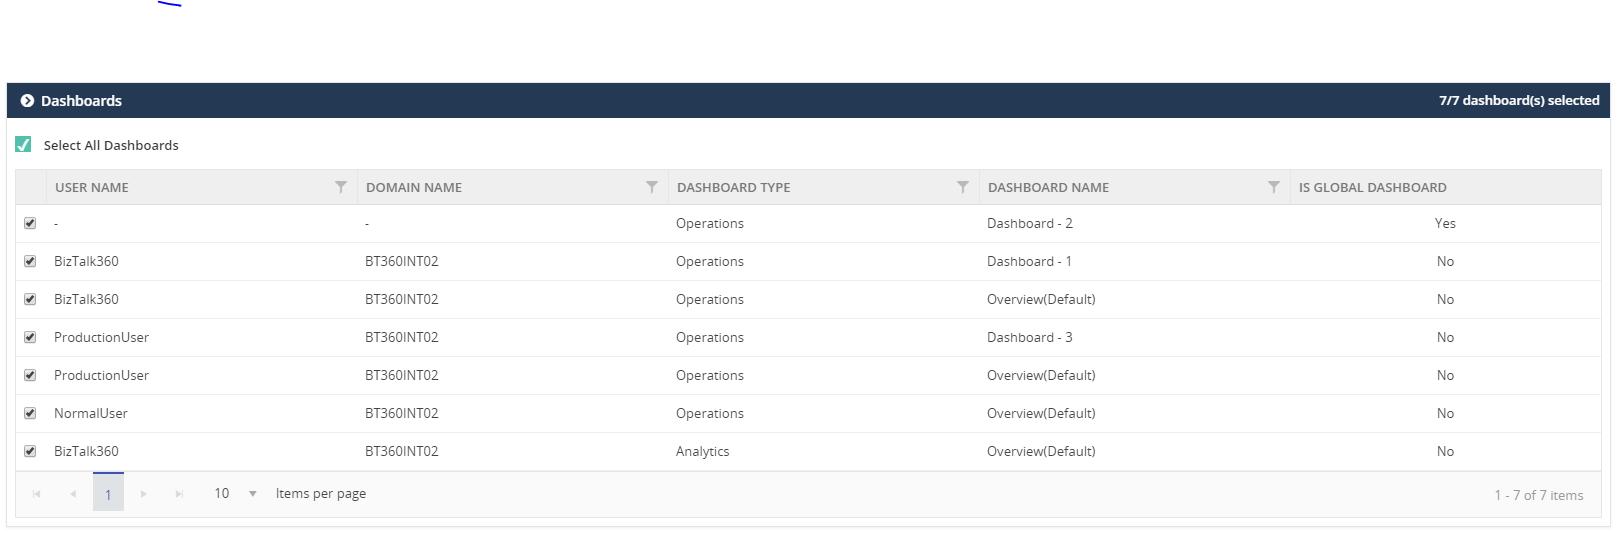 BizTalk360-Export-Dashboards.png